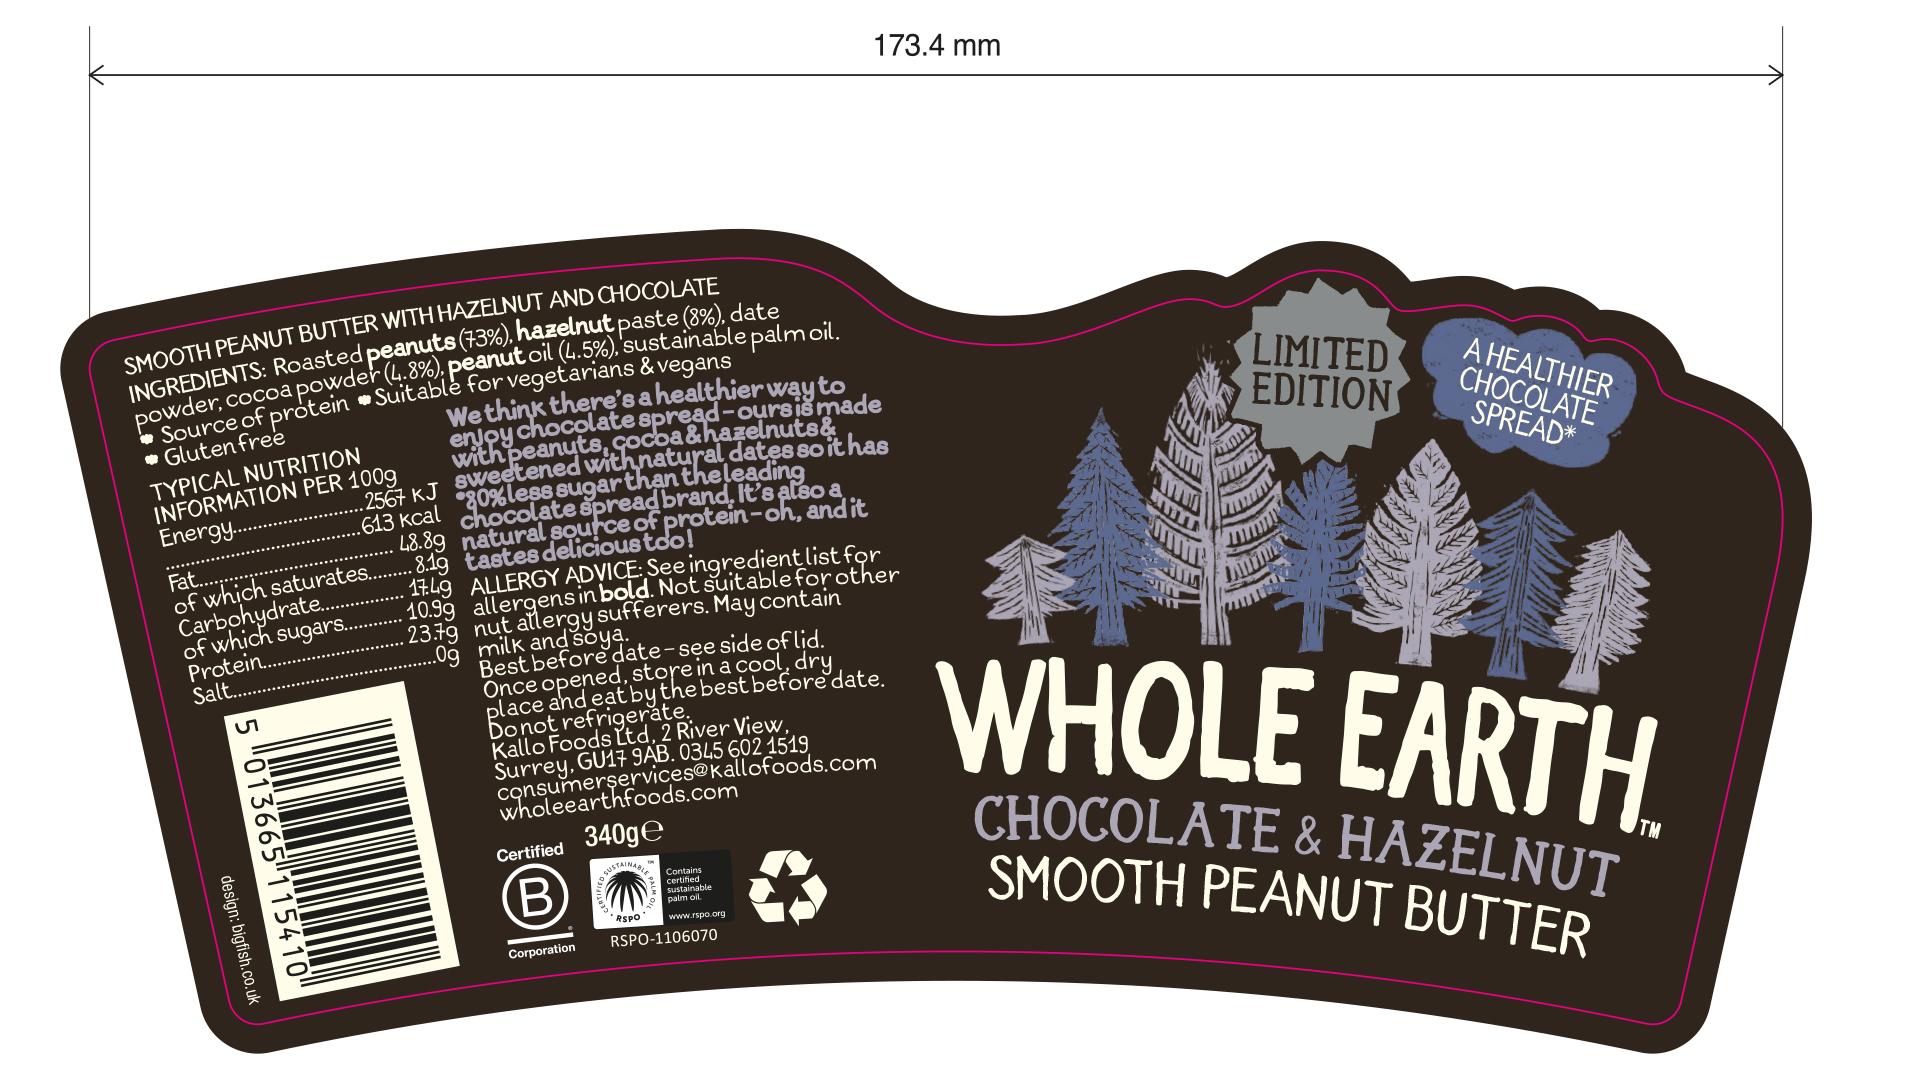 Whole_Earth_Peanut_butter_chocolate